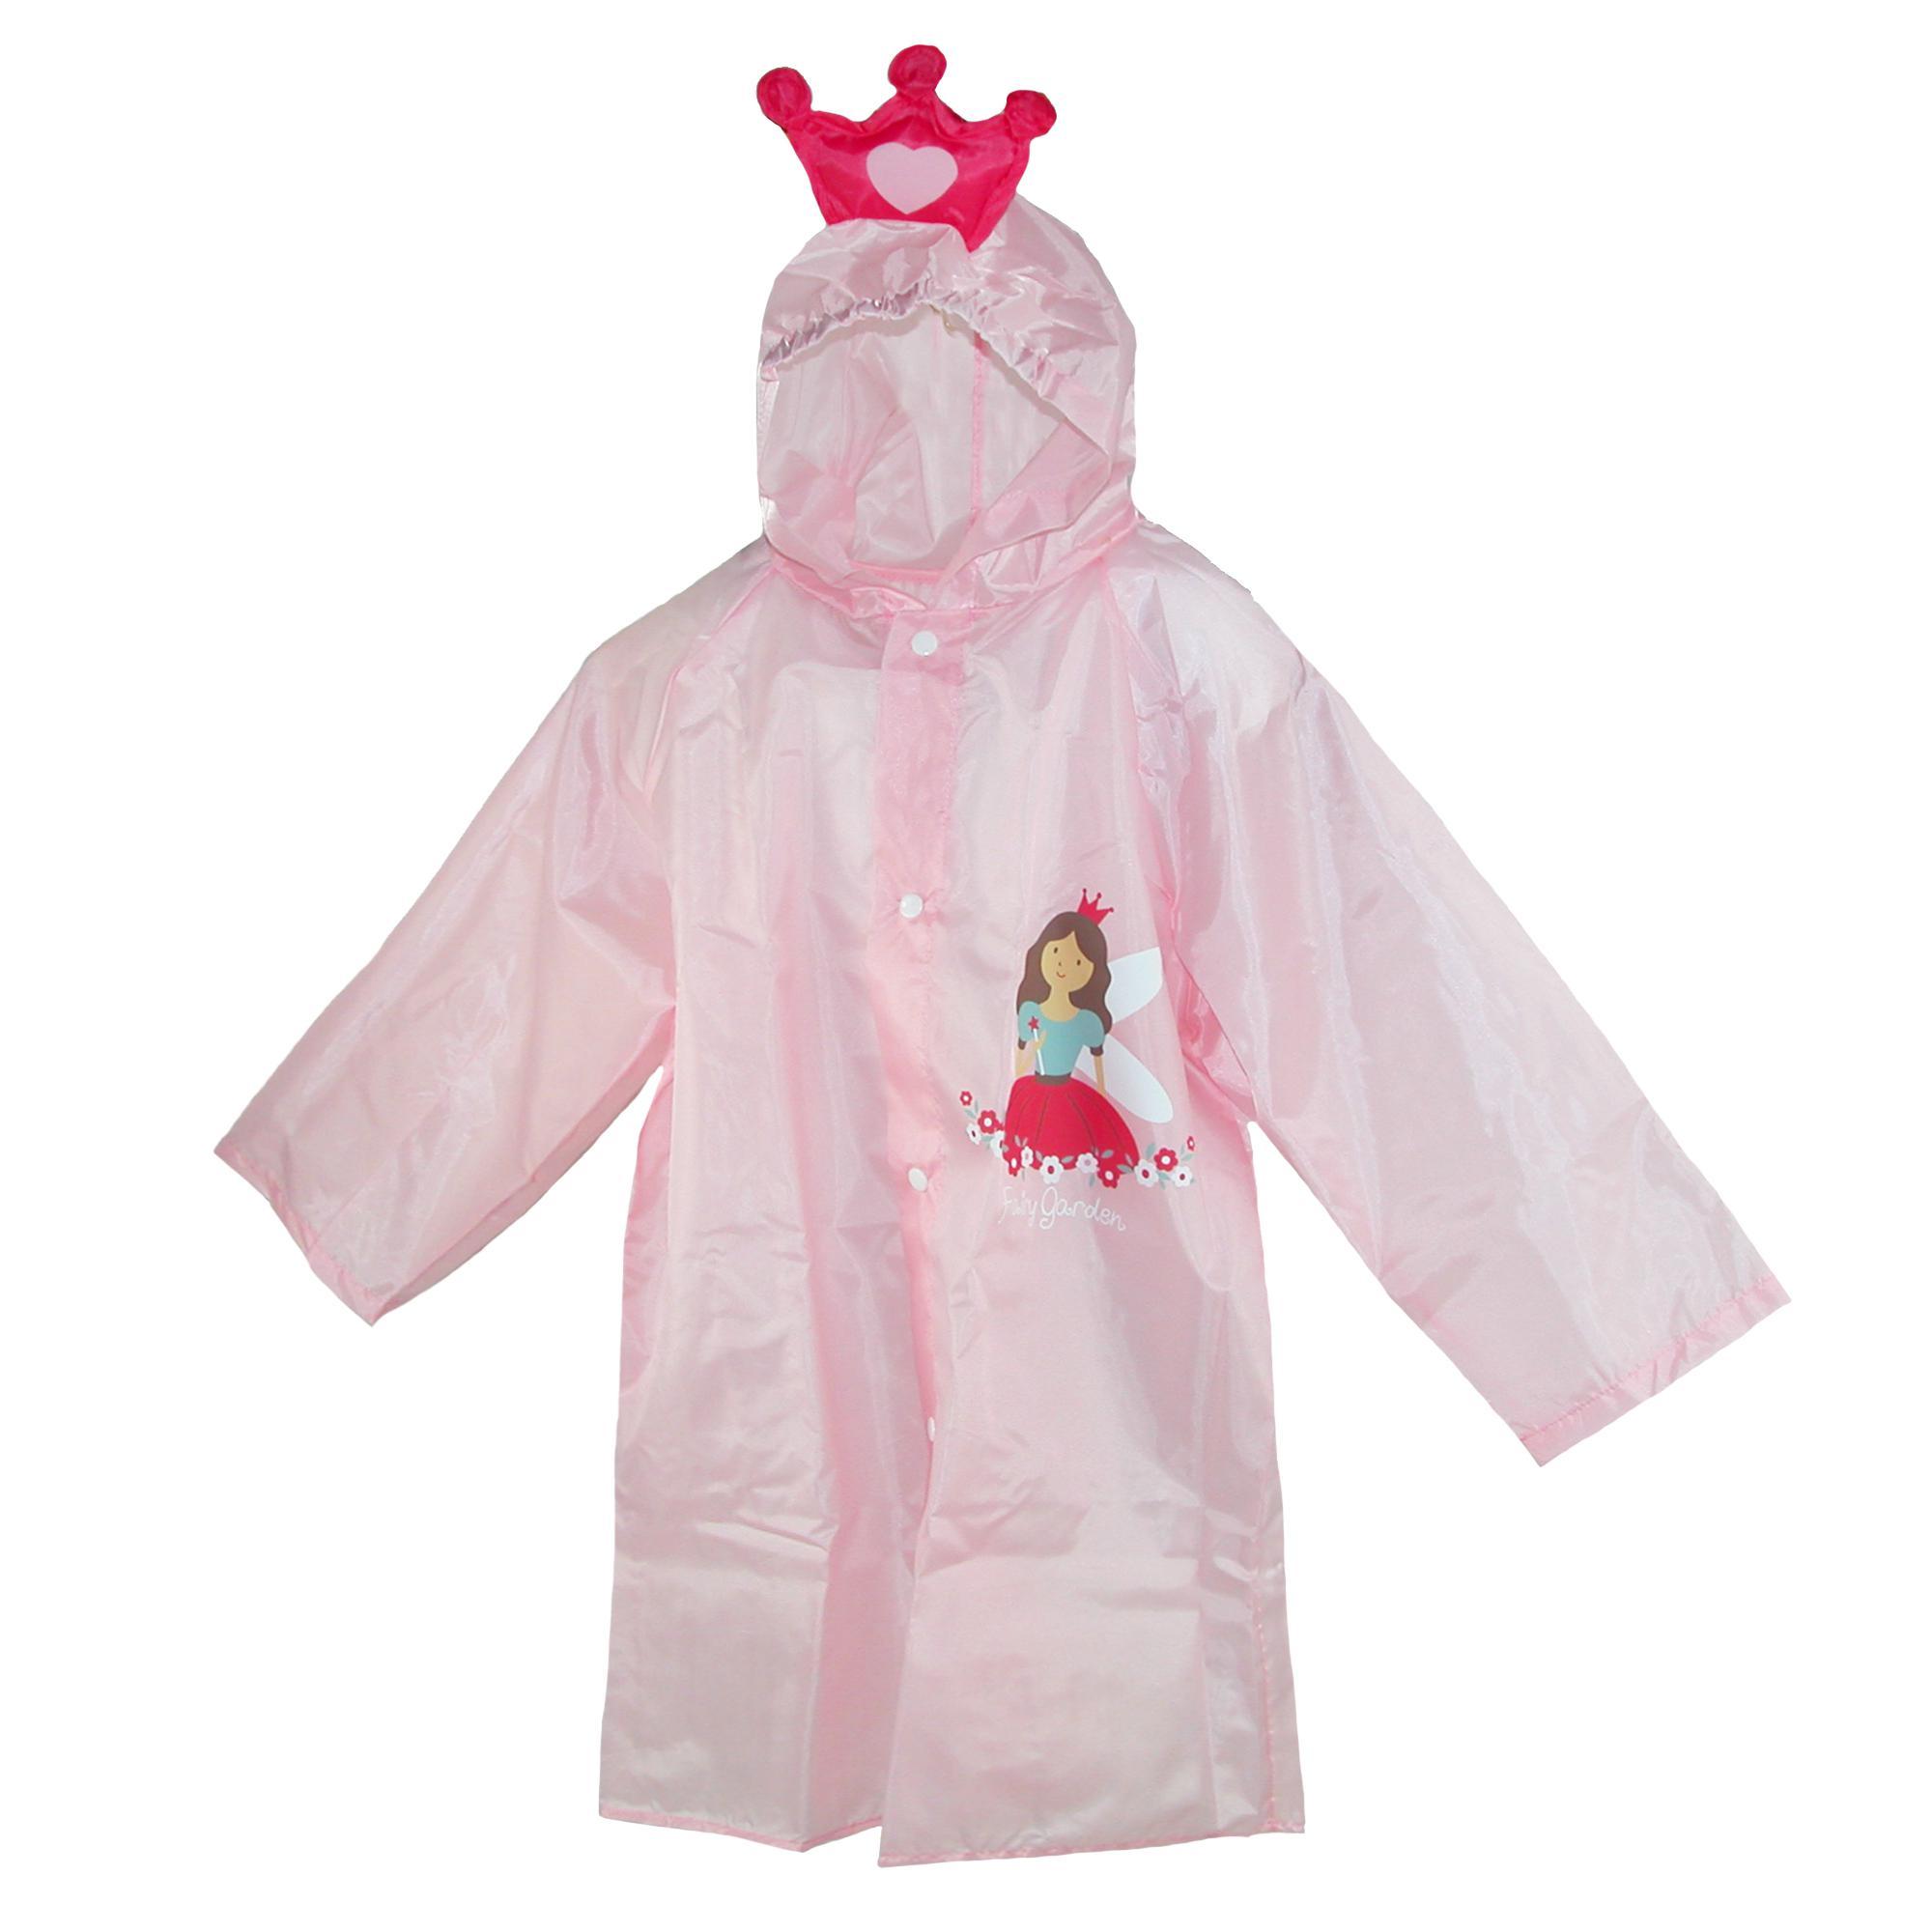 CTM Kid's Princess Rain Coat with Pouch